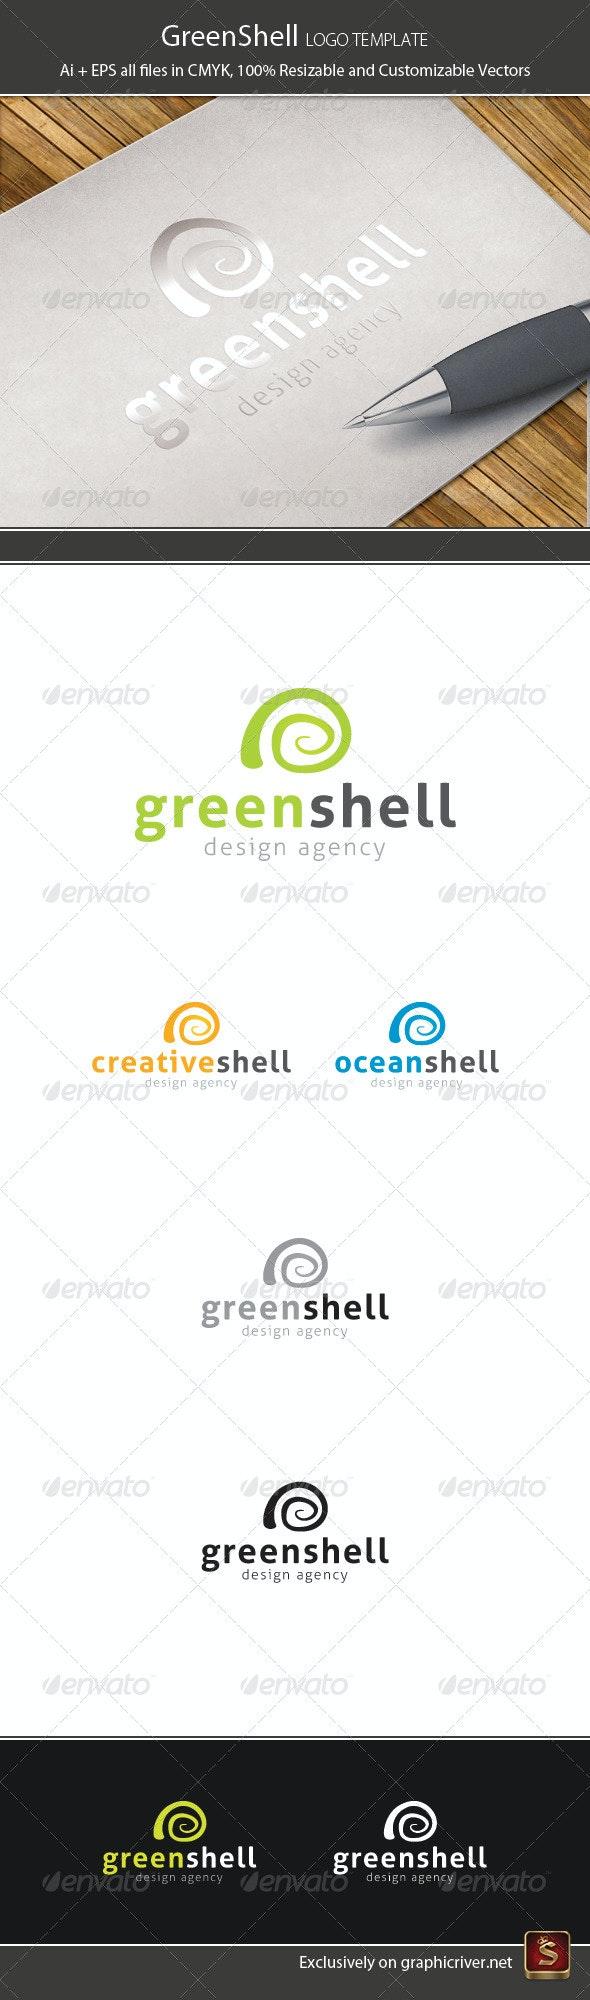 Green Shell Logo Template - Vector Abstract